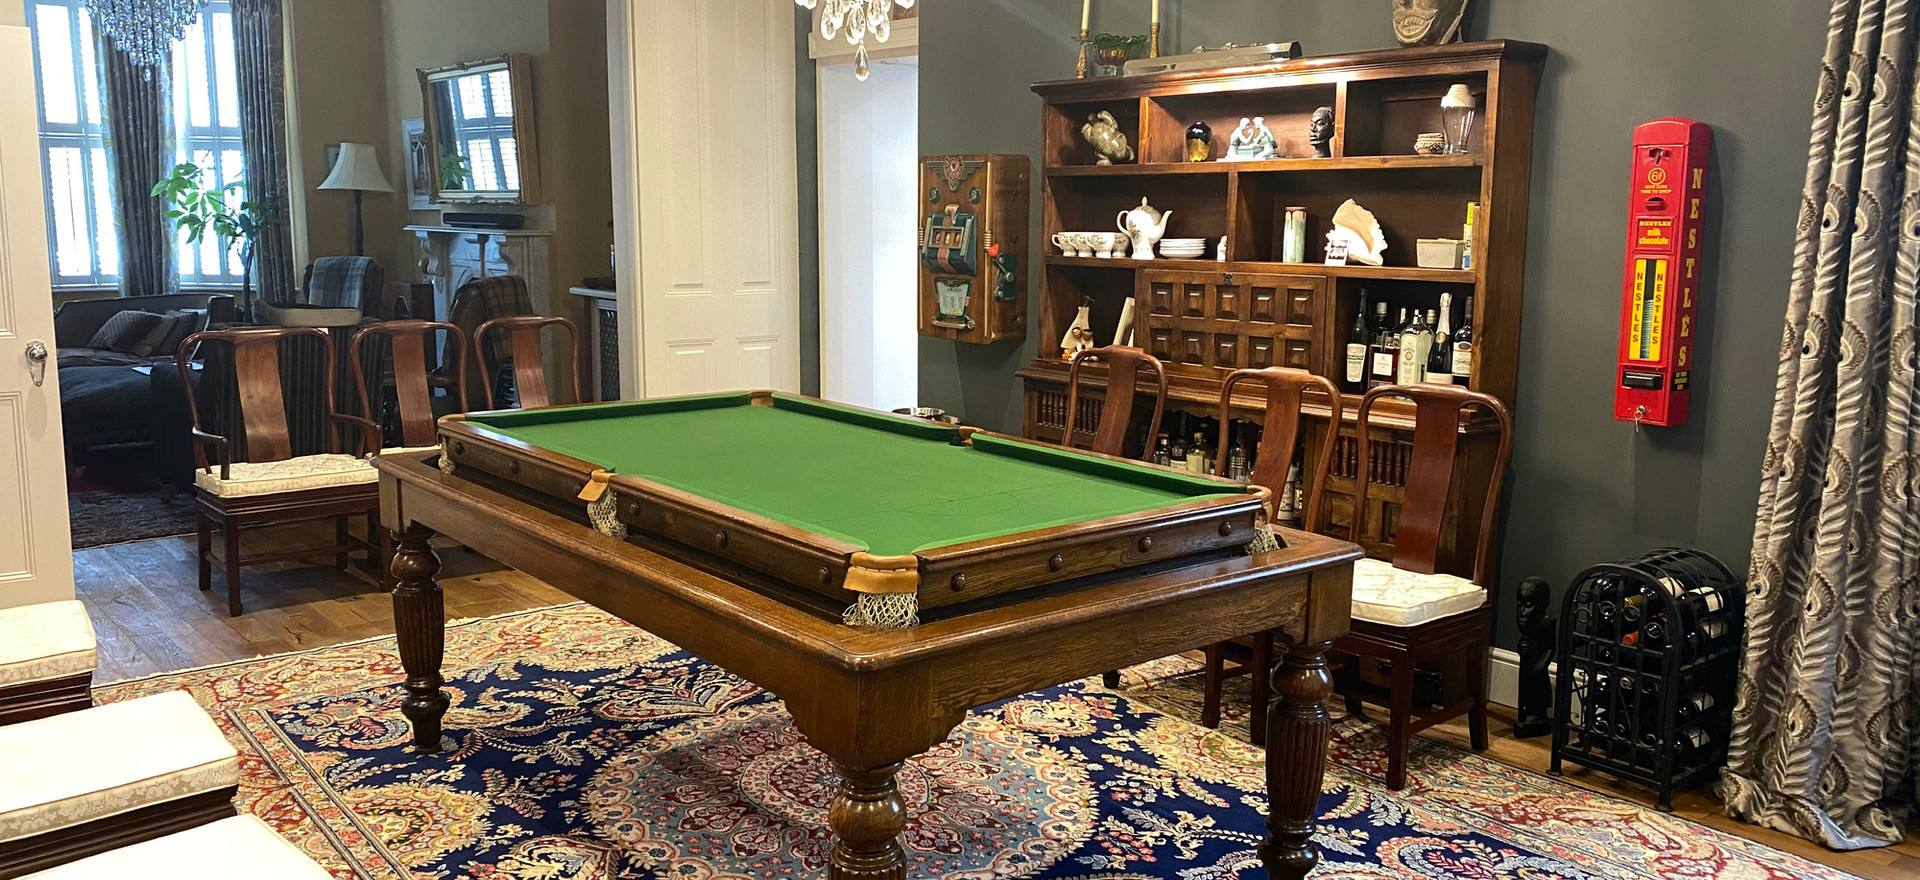 Snooker | Billiard | Pool Table | RolloverConvertibleDining Table